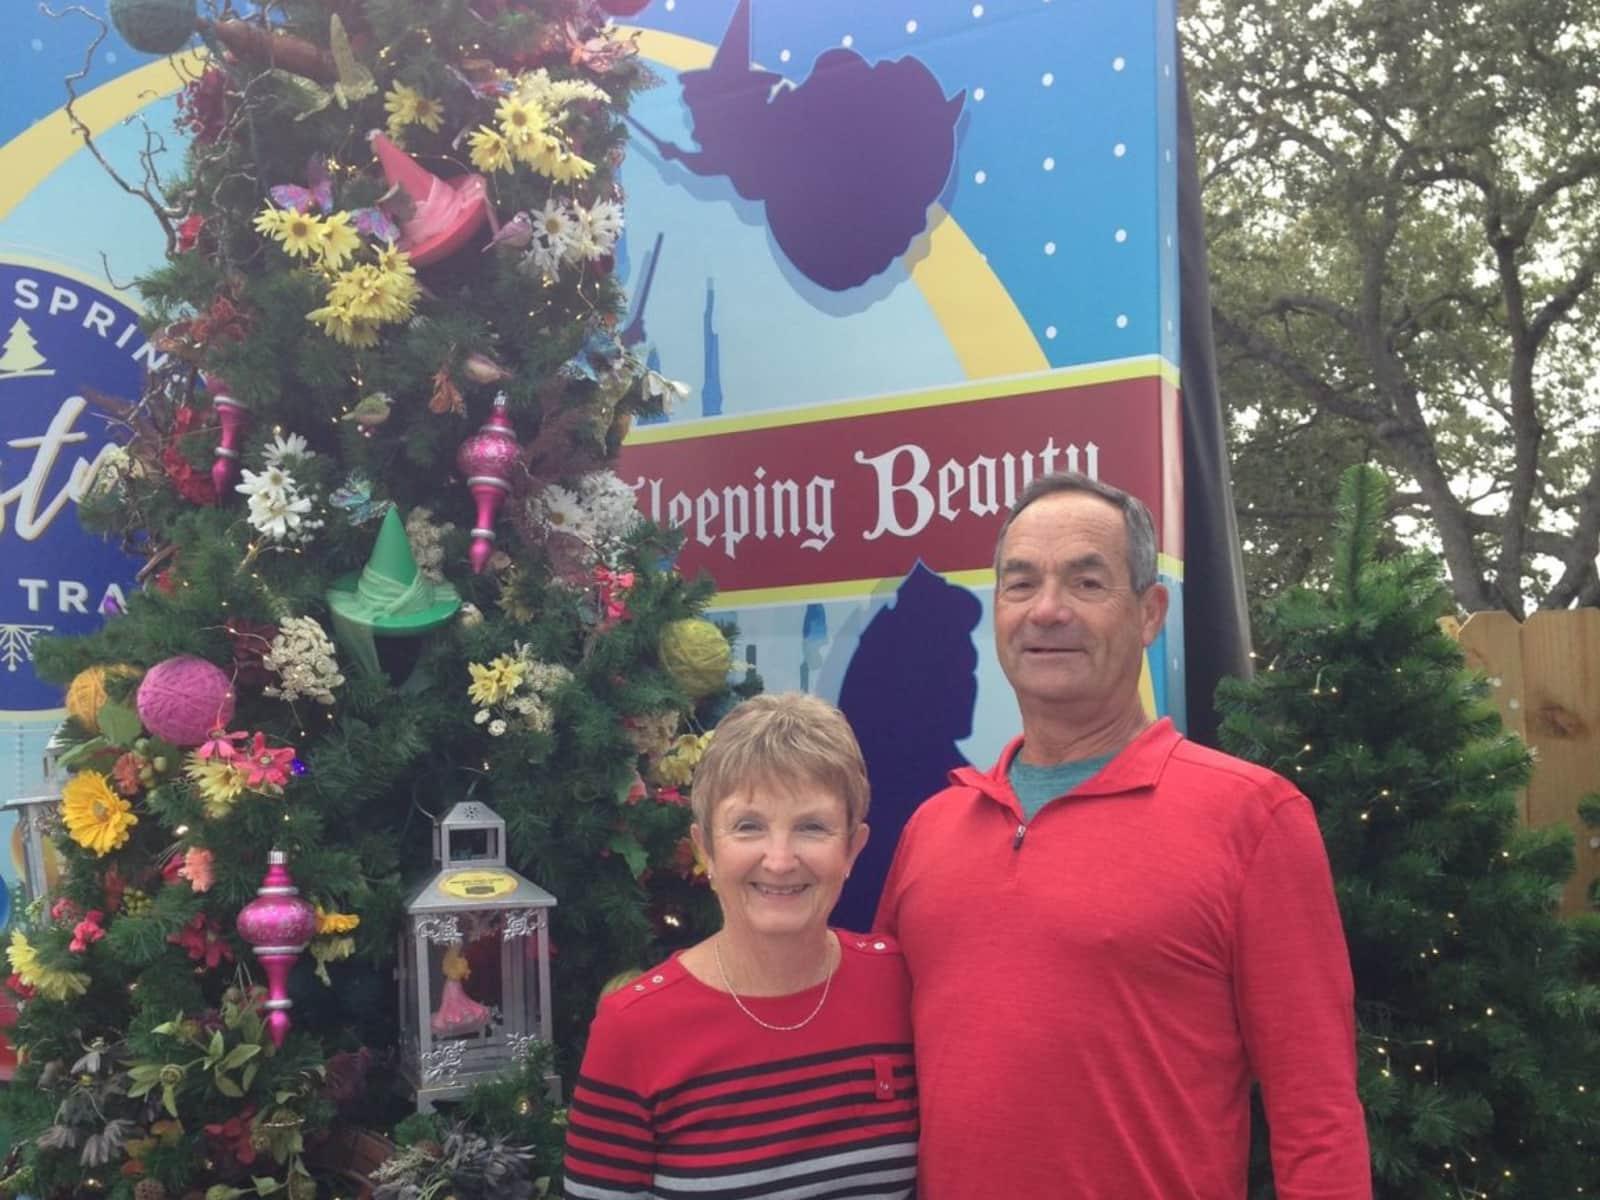 Cathy & Scott from Stratford, Ontario, Canada